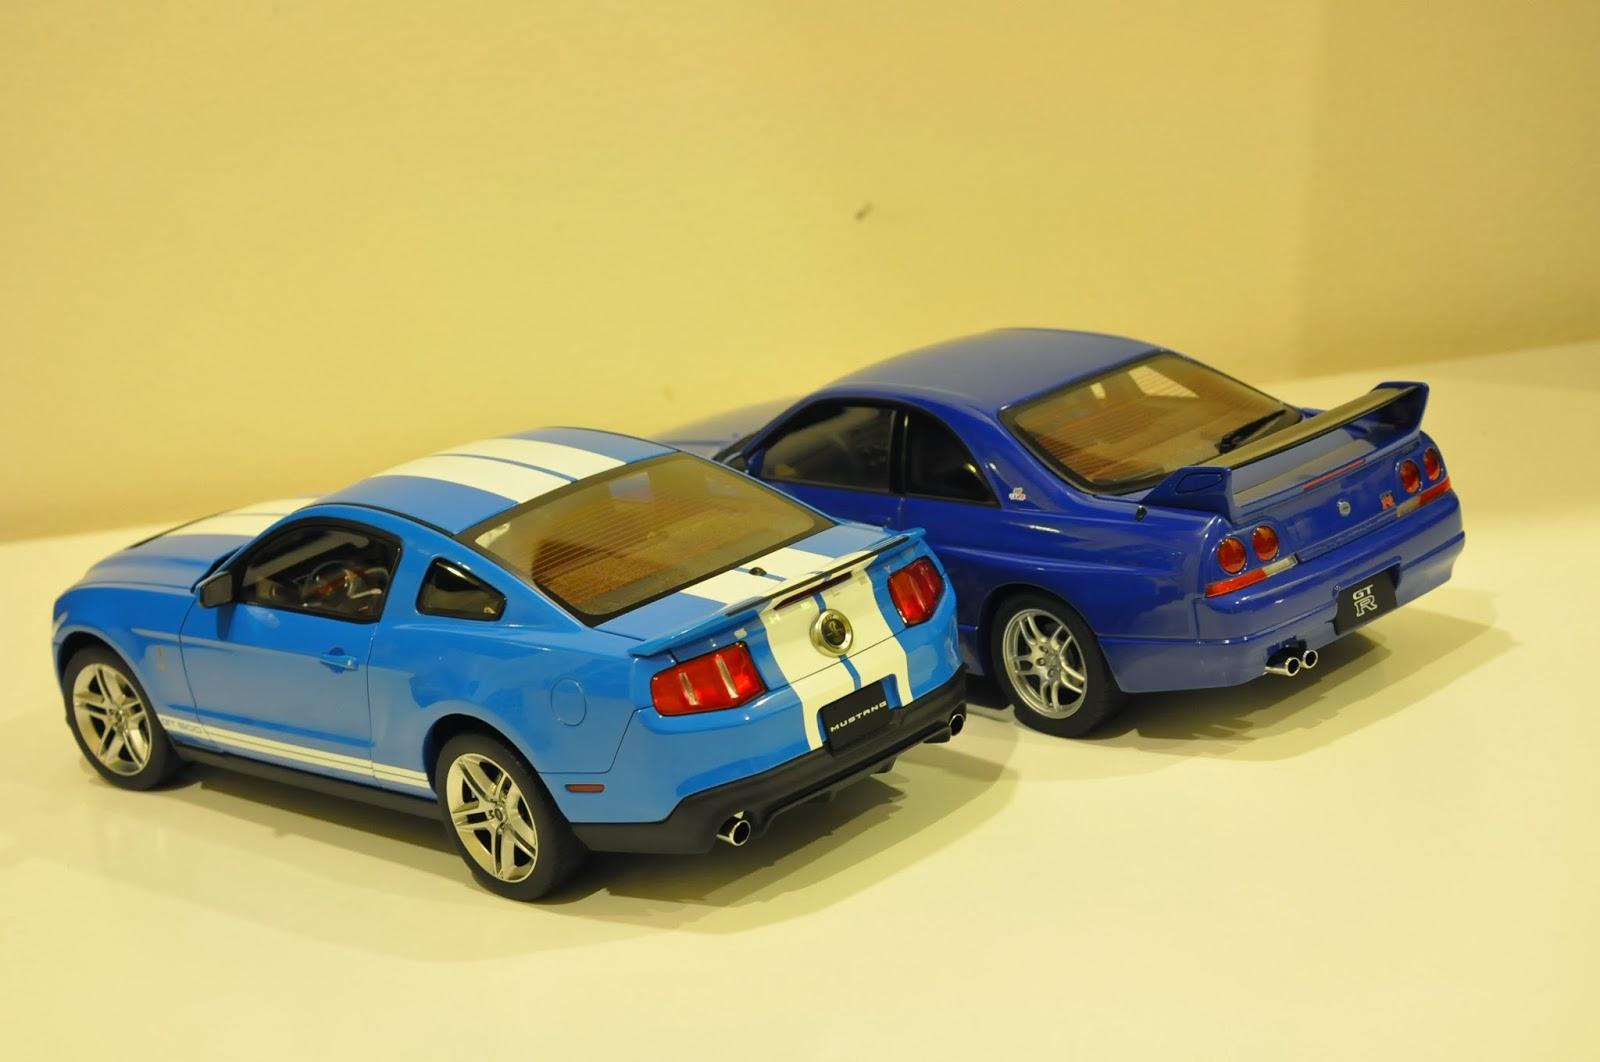 AutoArt Nissan Skyline R33 GTR LeMan Edition vs AutoArt